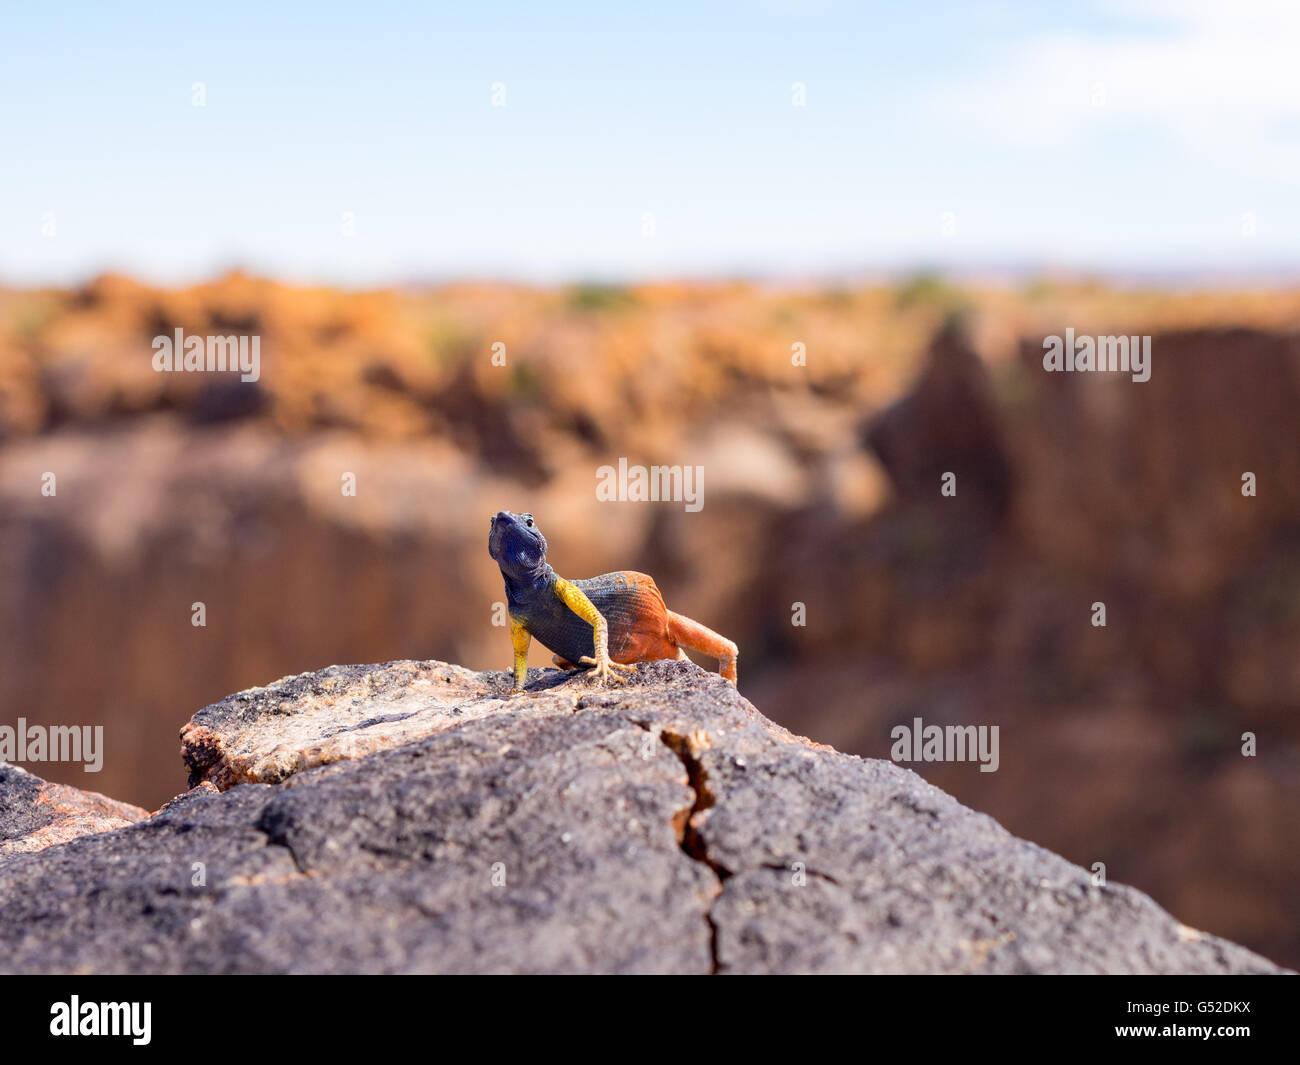 South Africa, North Cape, Benede Oranje, Augrabies Falls National Park, Lizard on Rock, Platysaurus Broadleyi Stock Photo